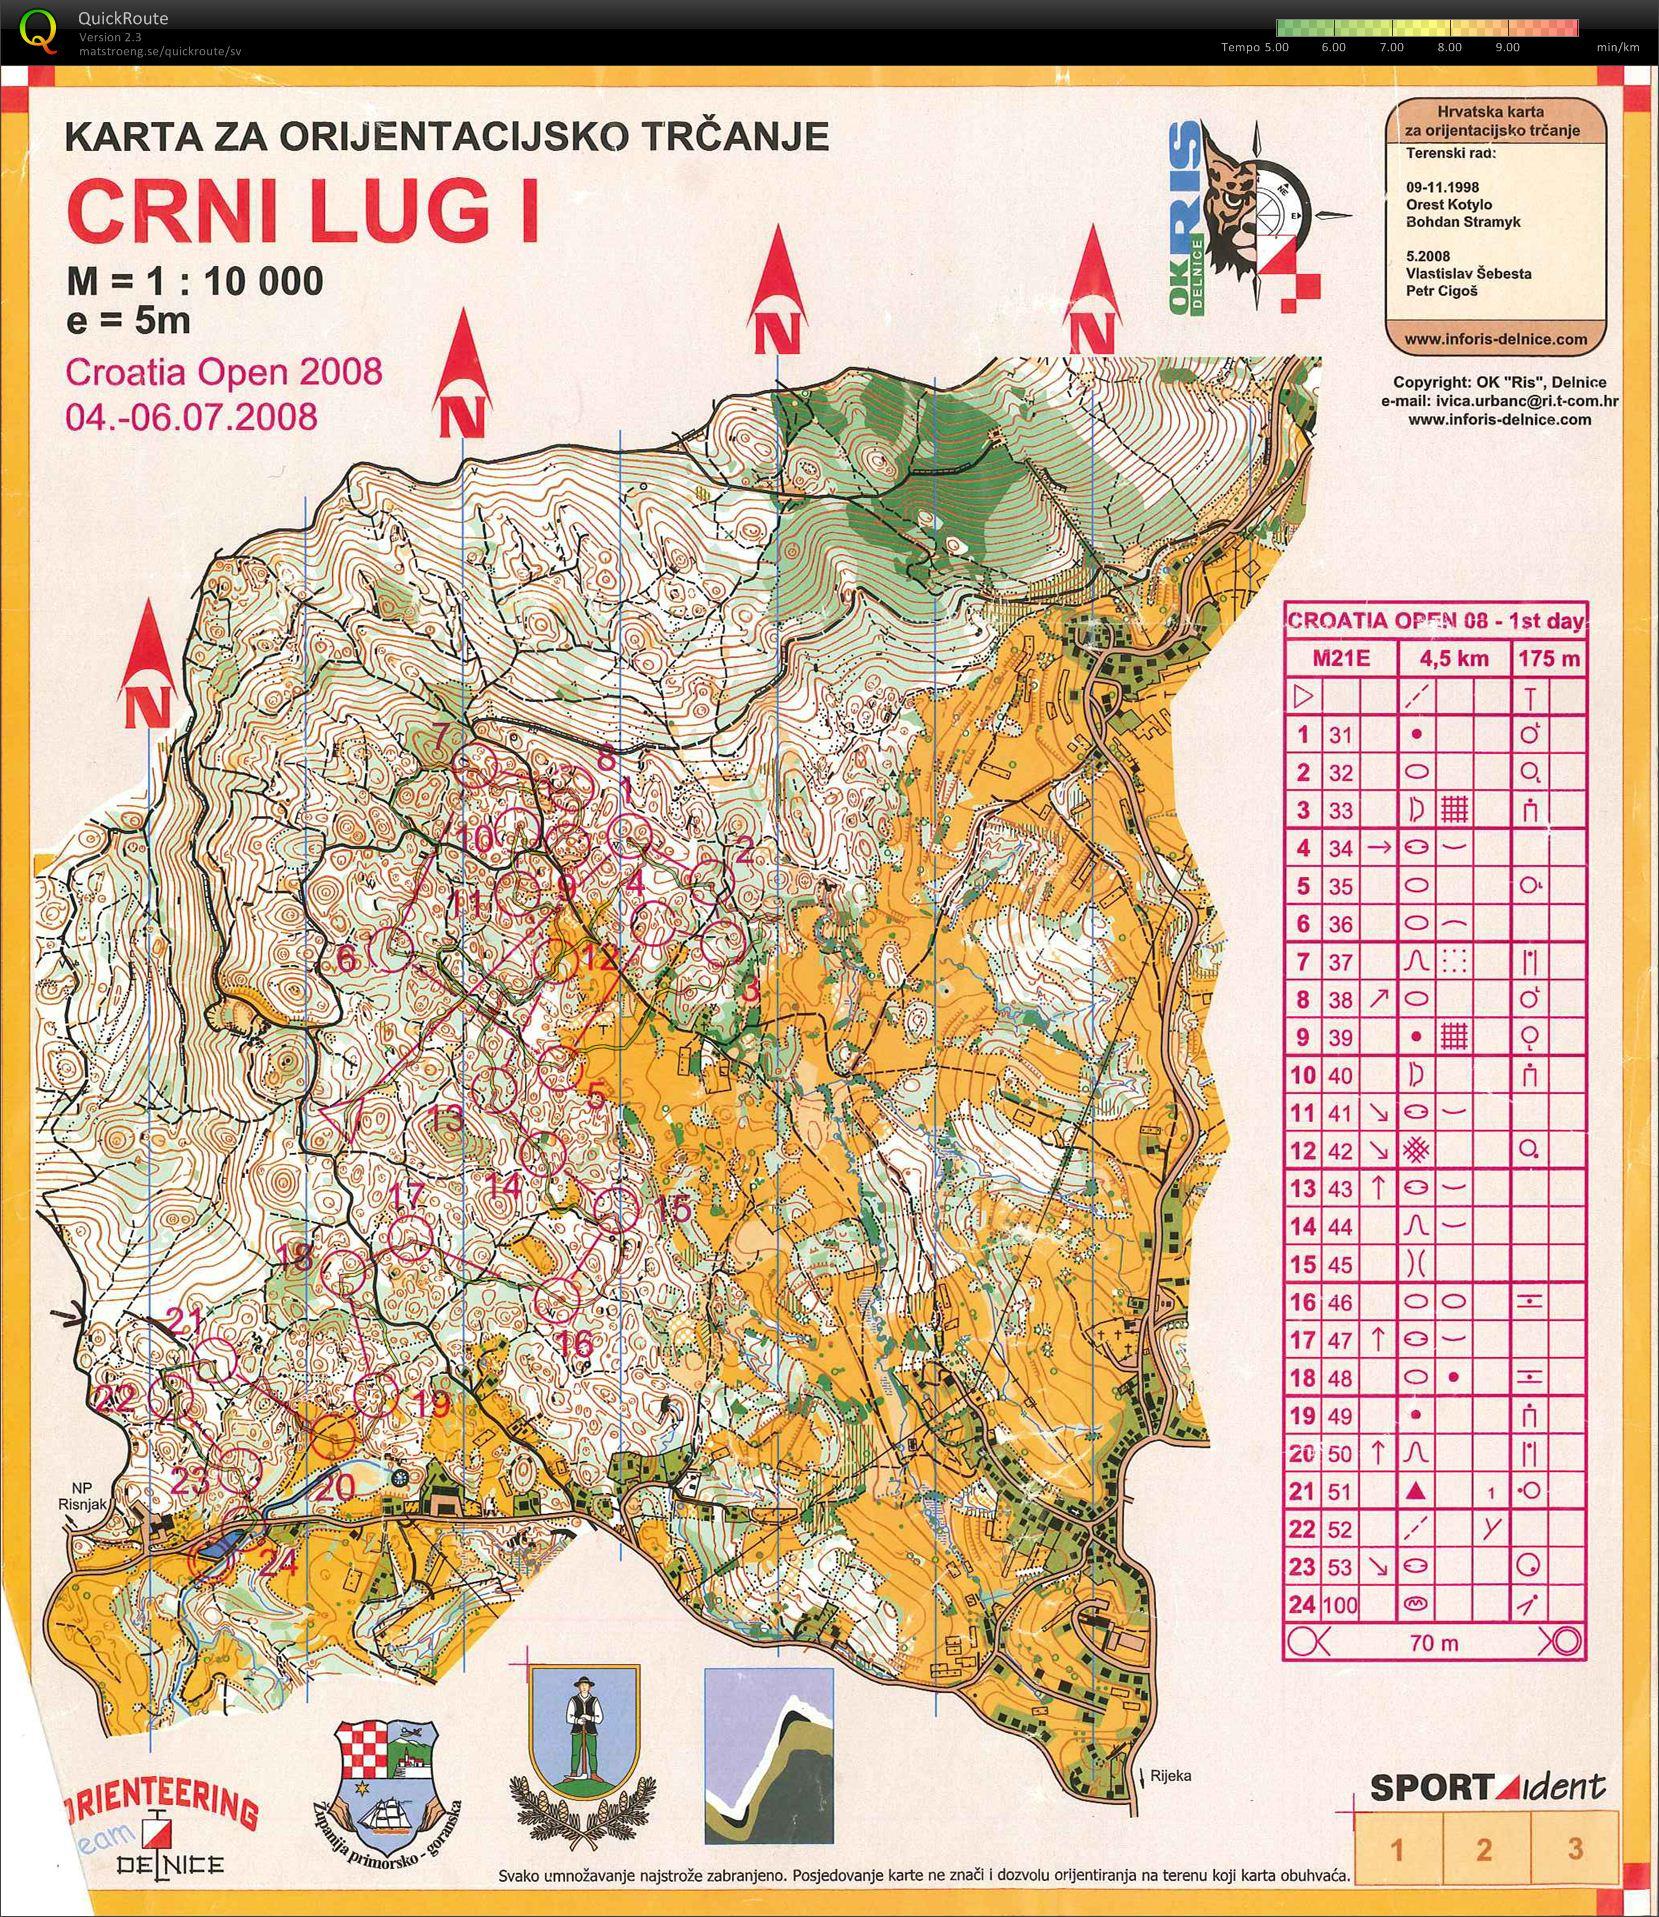 Croatia Open training I